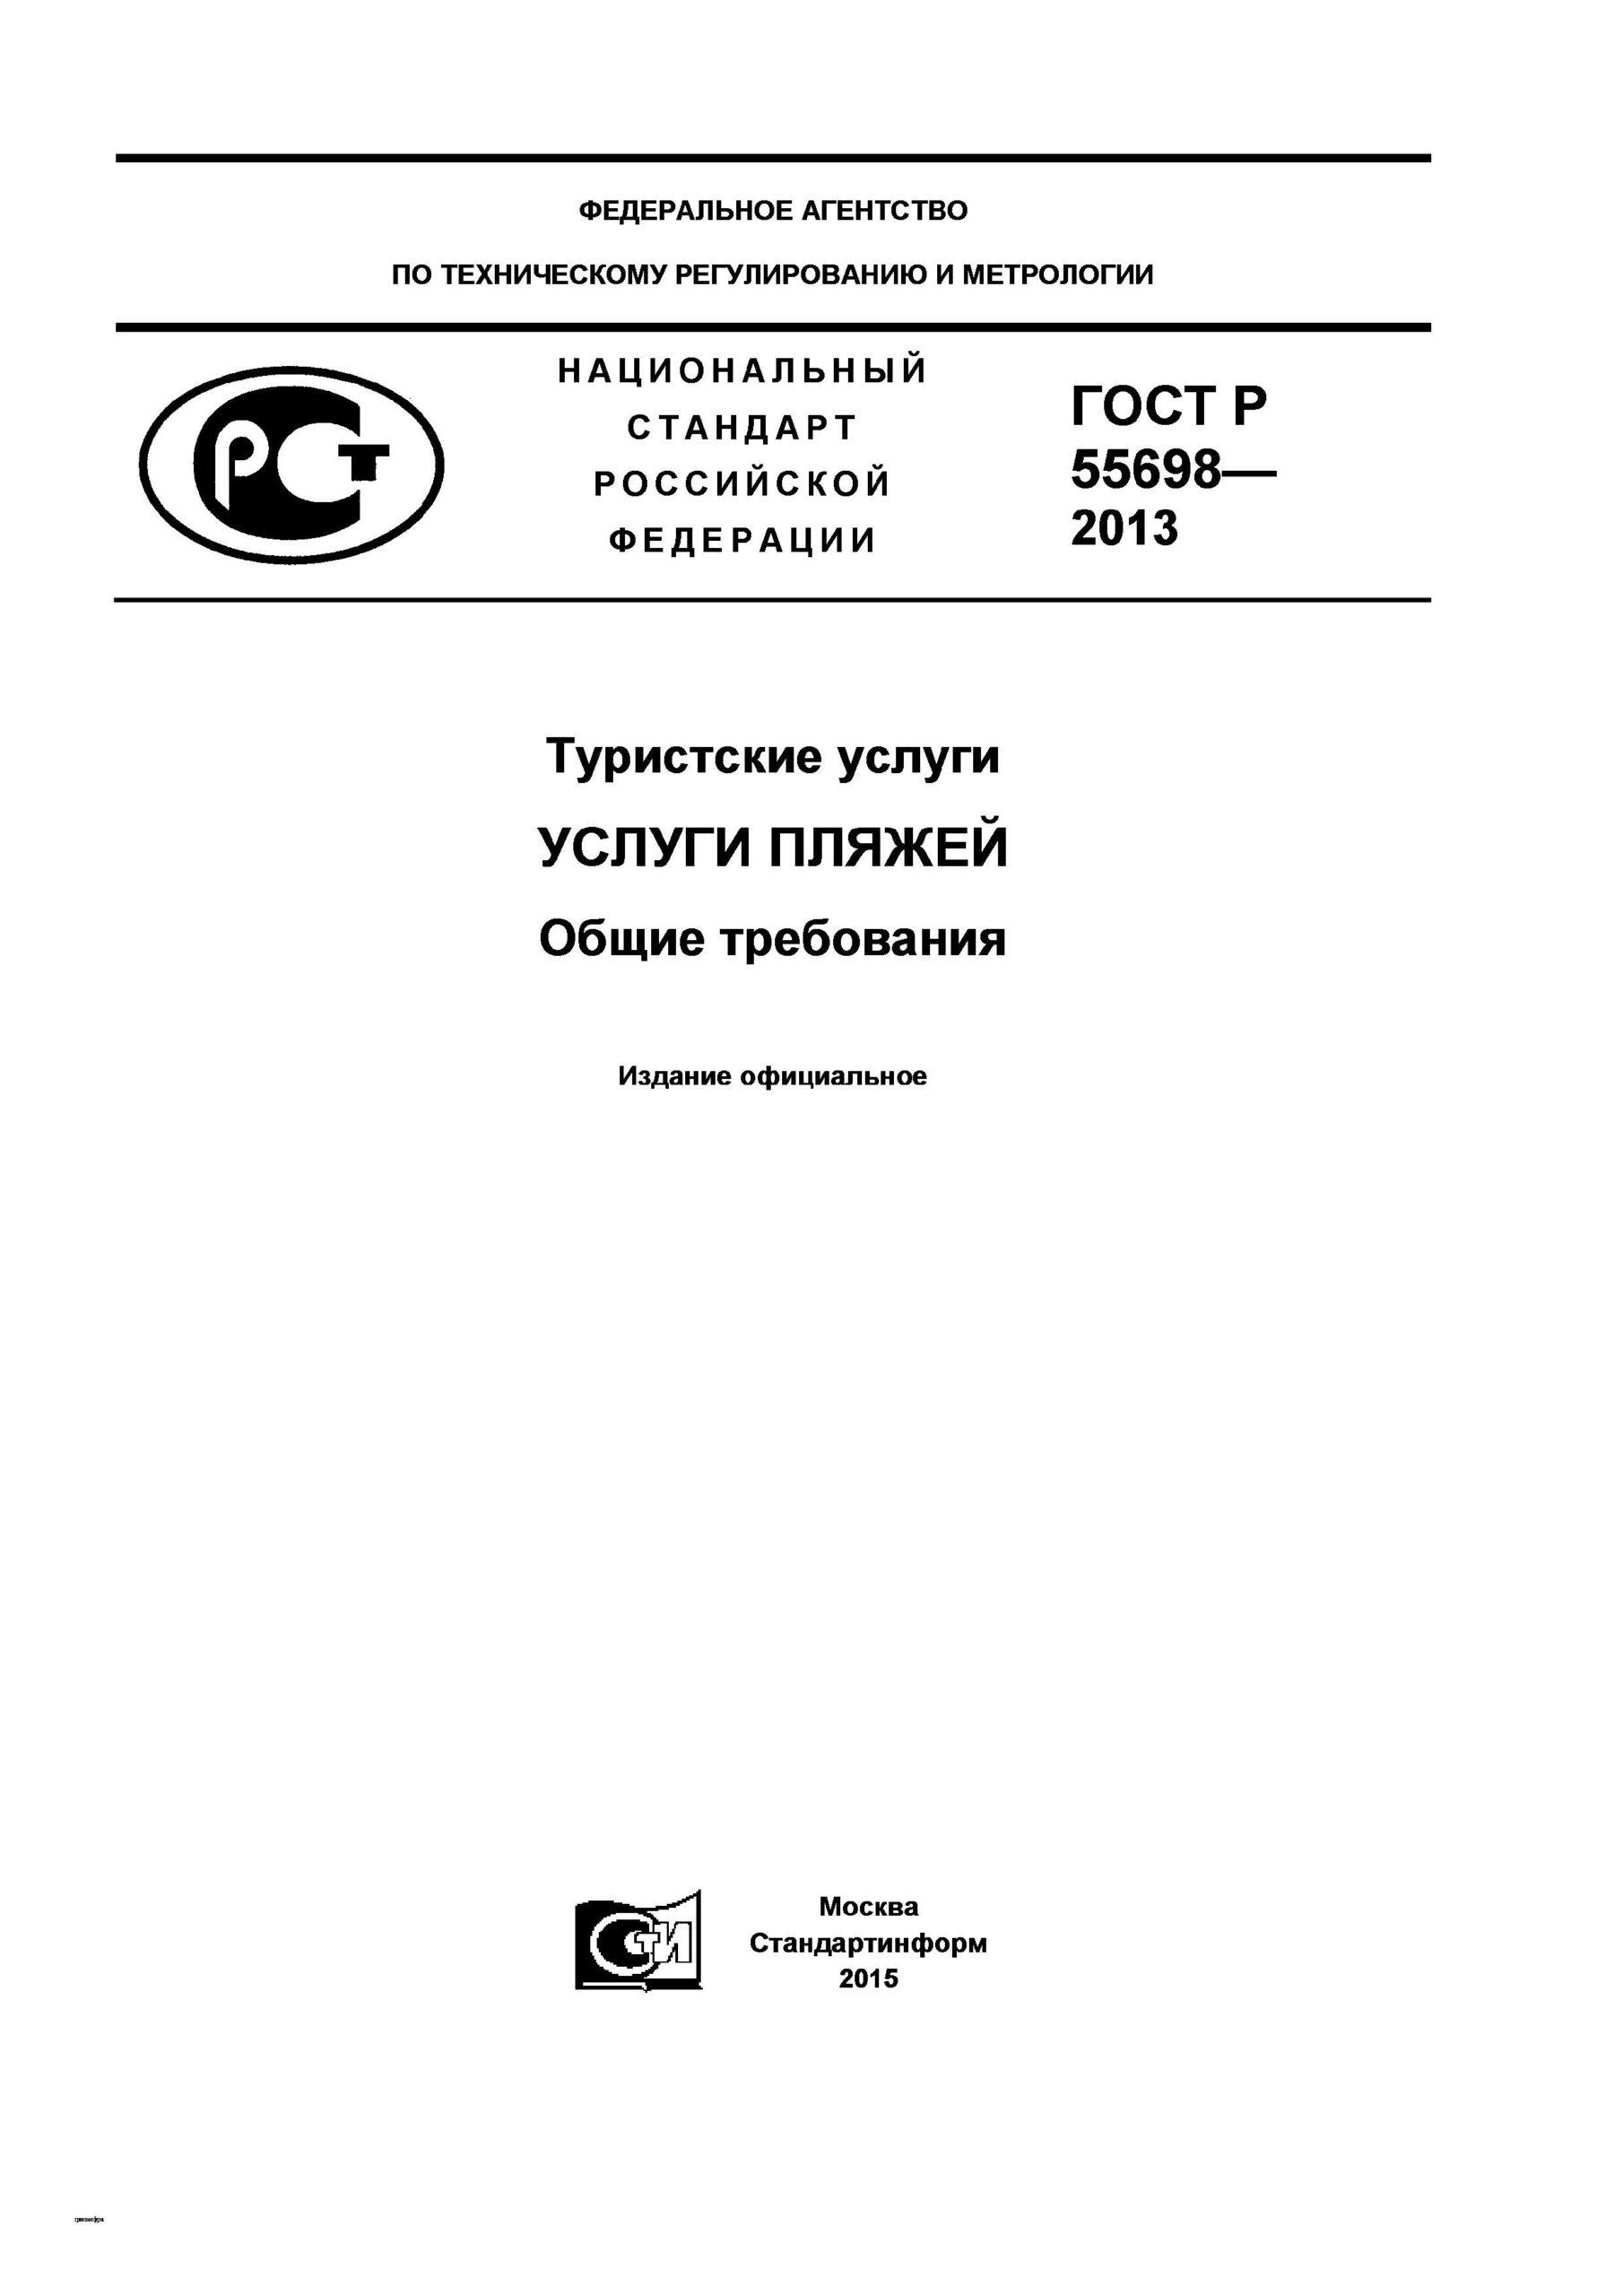 ГОСТ Р 55698-2013